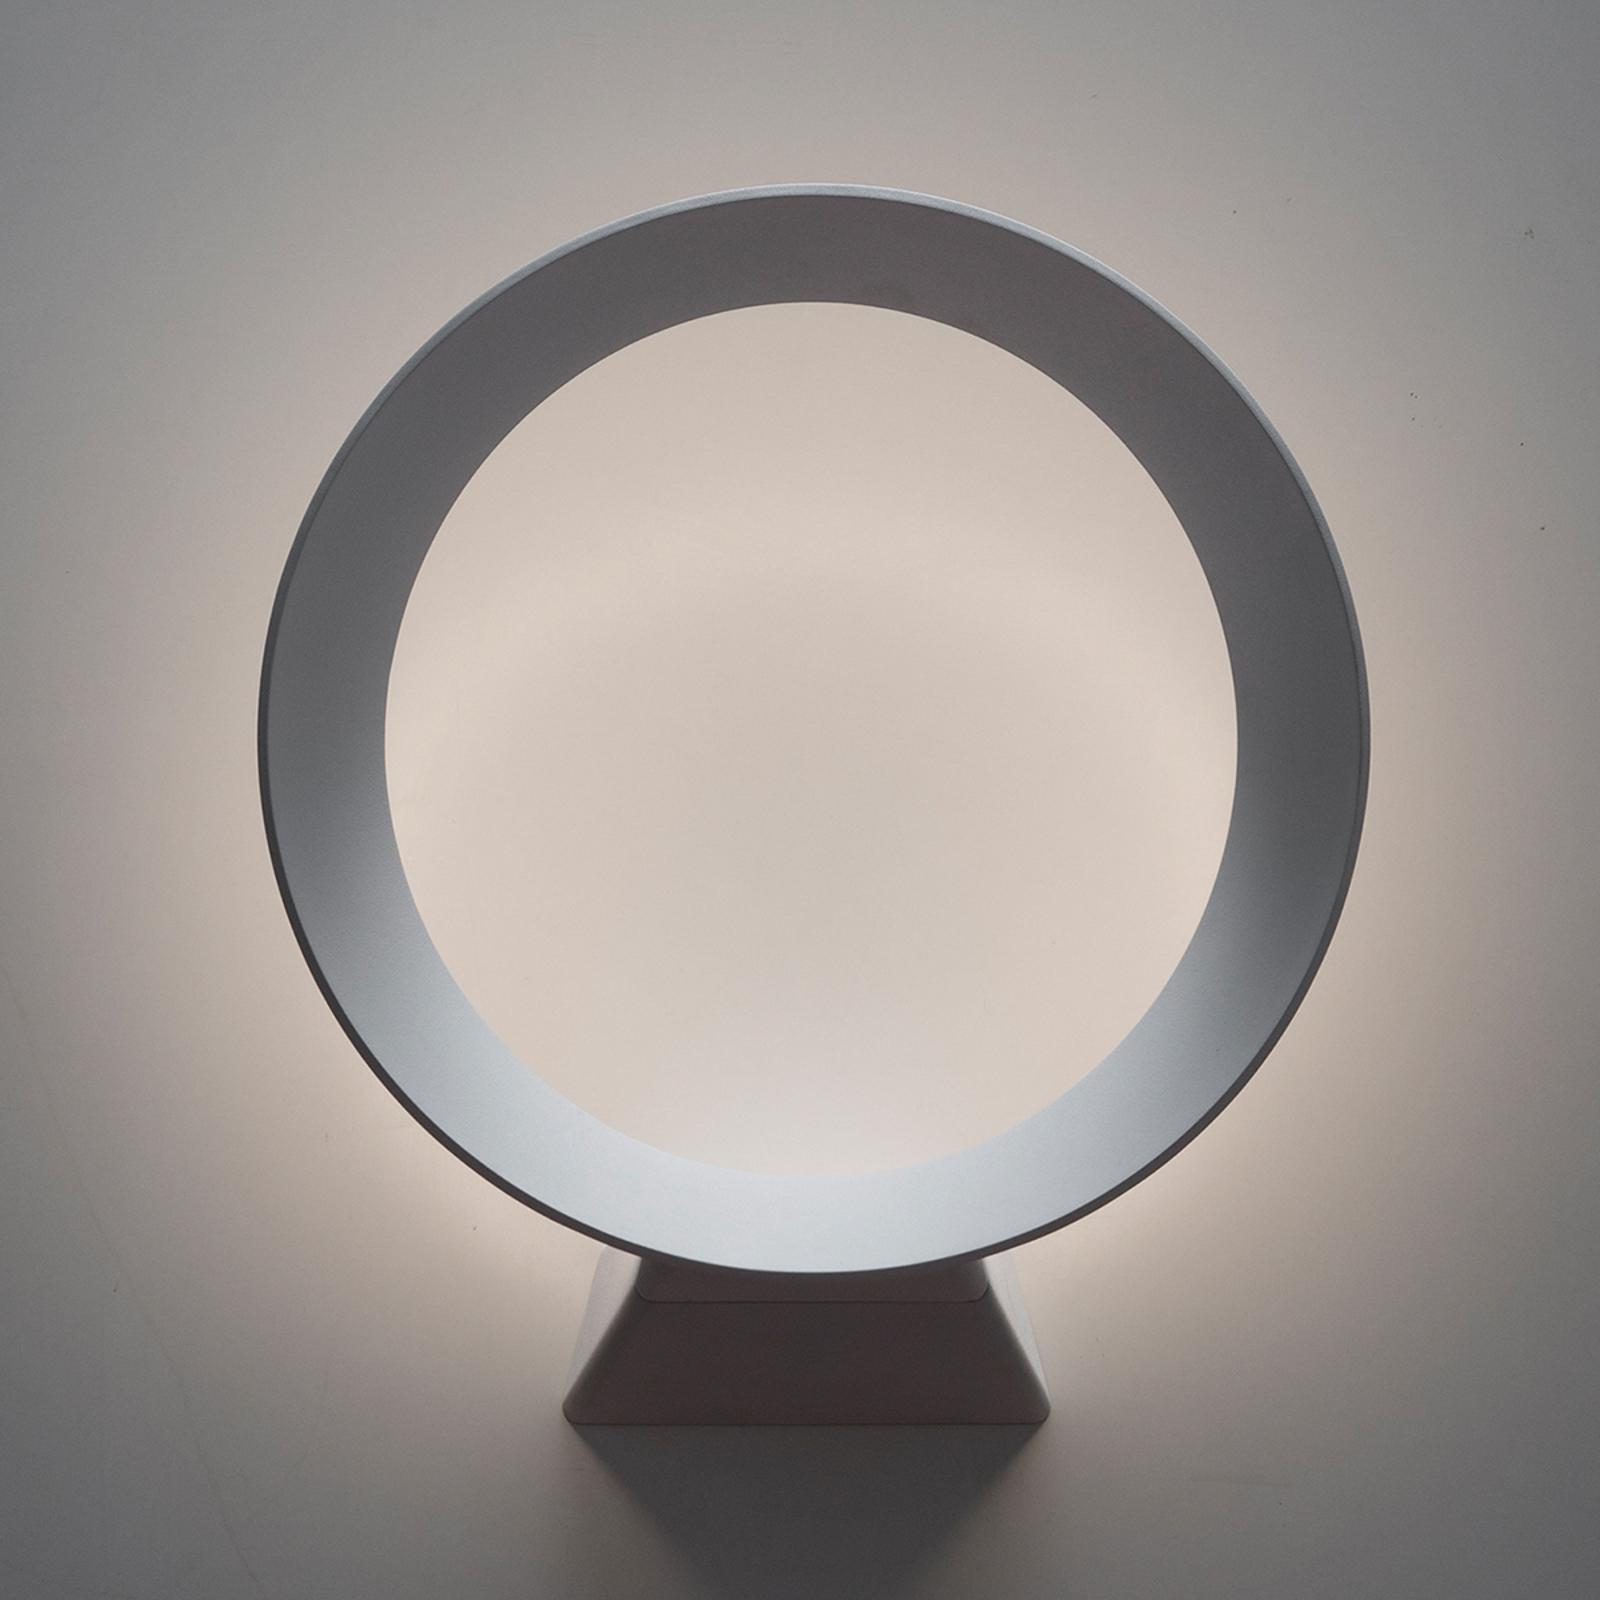 Martinelli Luce LED+O -seinävalaisin 18 W, 3 000 K